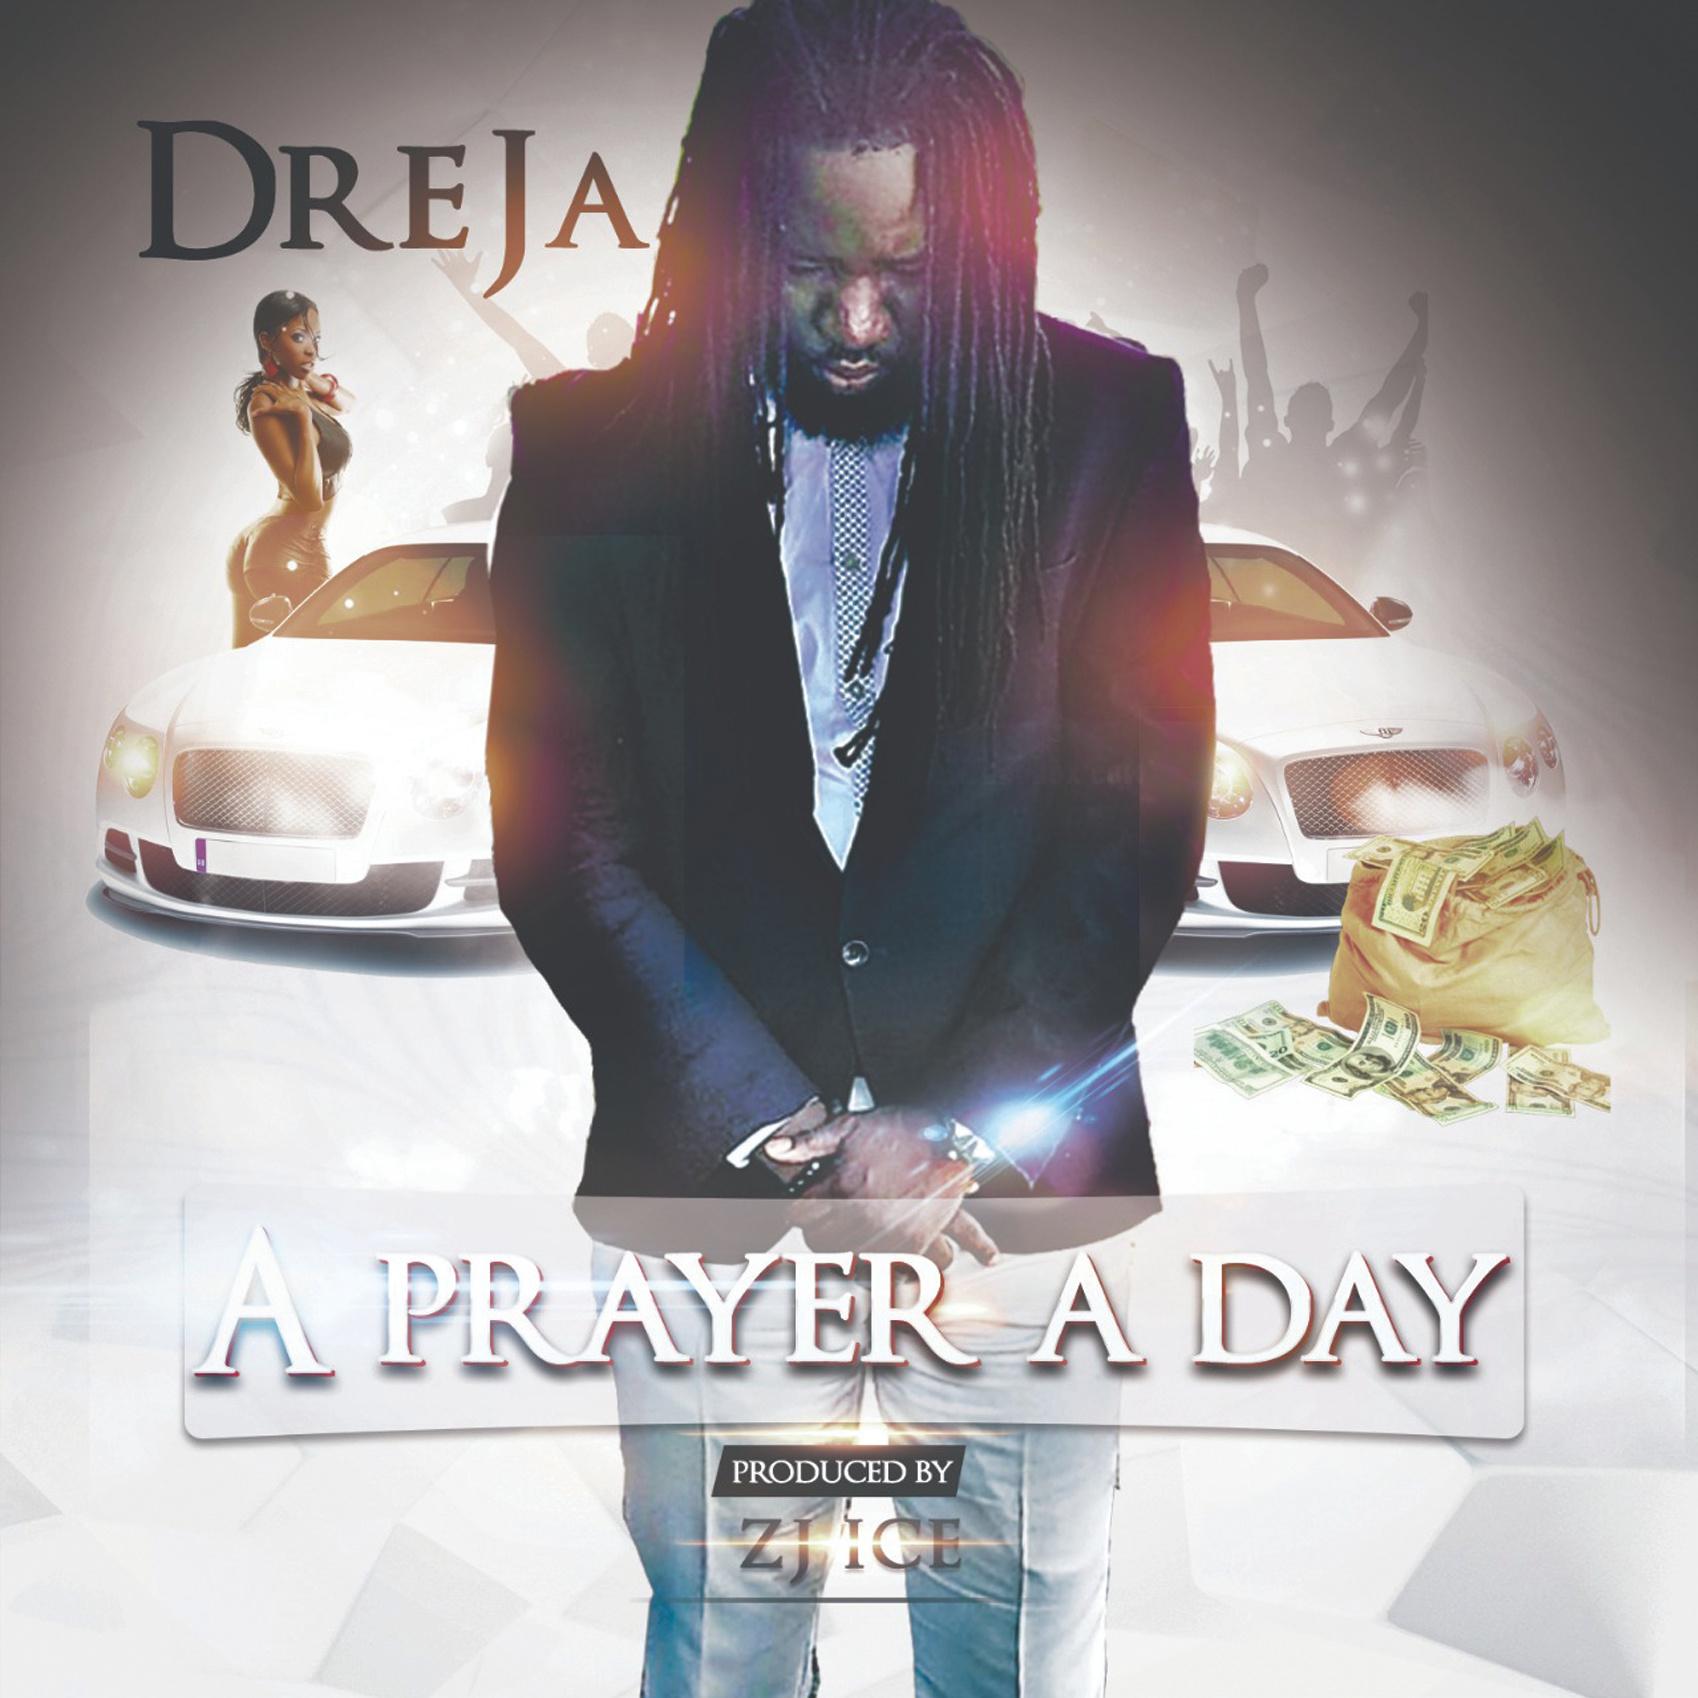 Dre Ja A Prayer A Day Cover